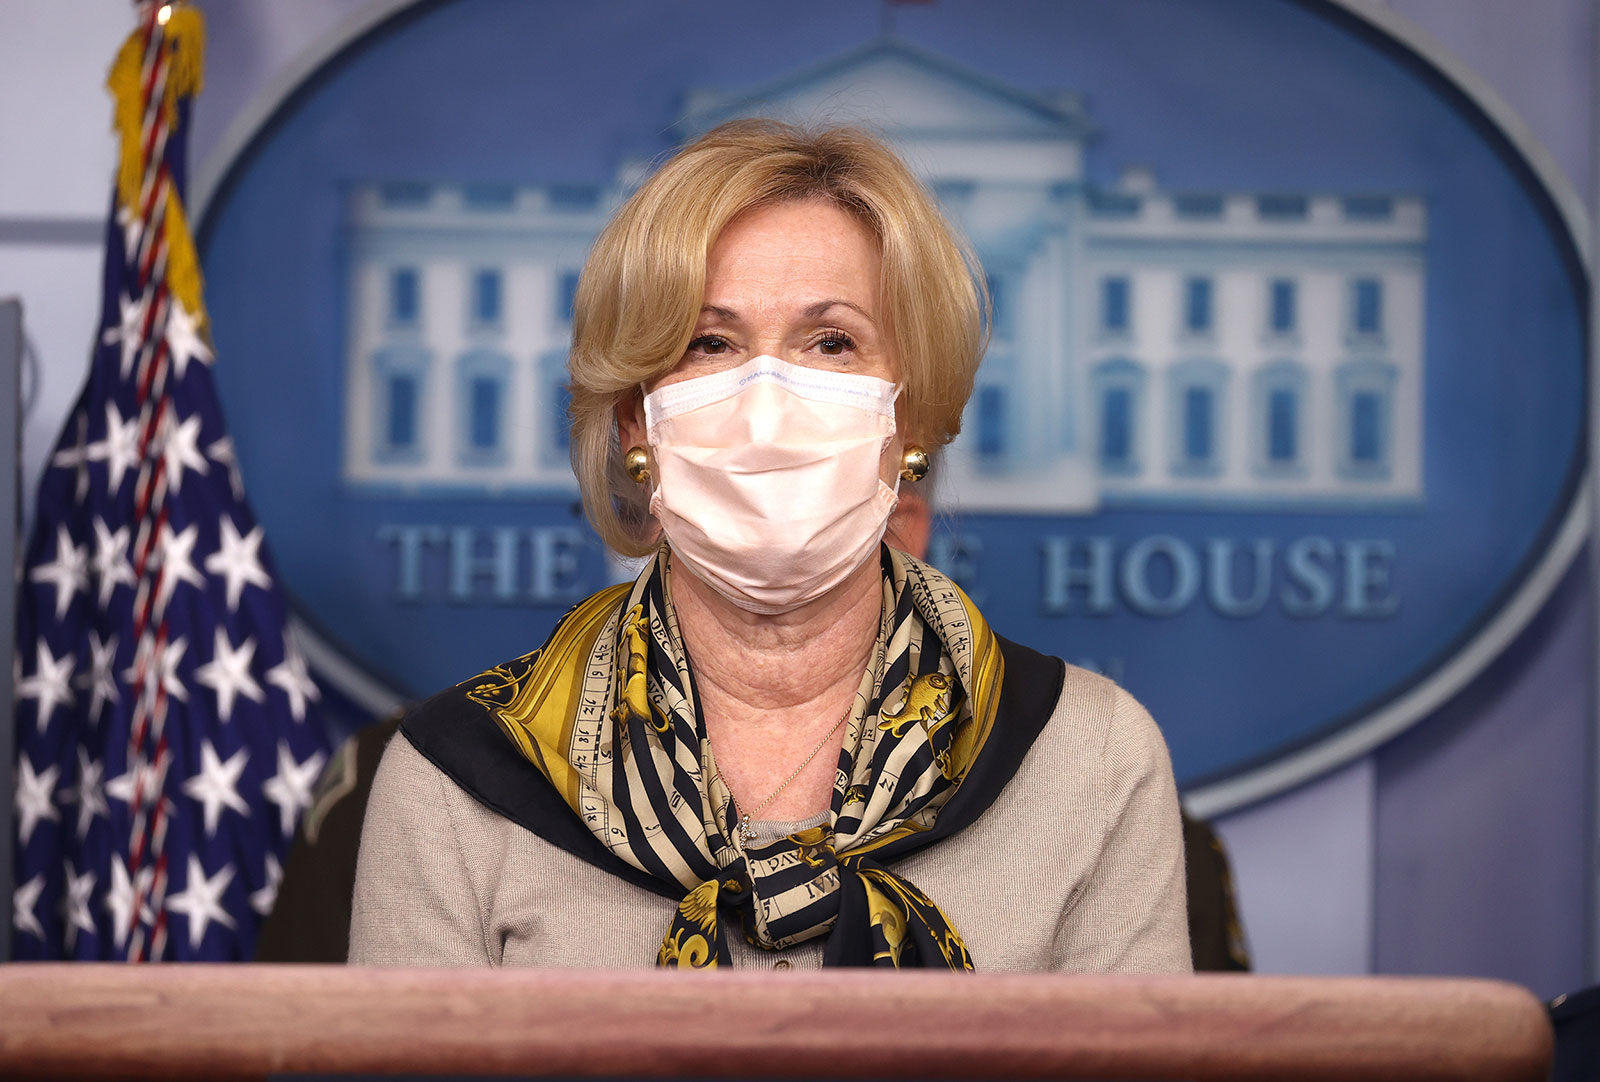 Dr. Deborah Birx speaks during a coronavirus task force briefing at the White House on November 19.